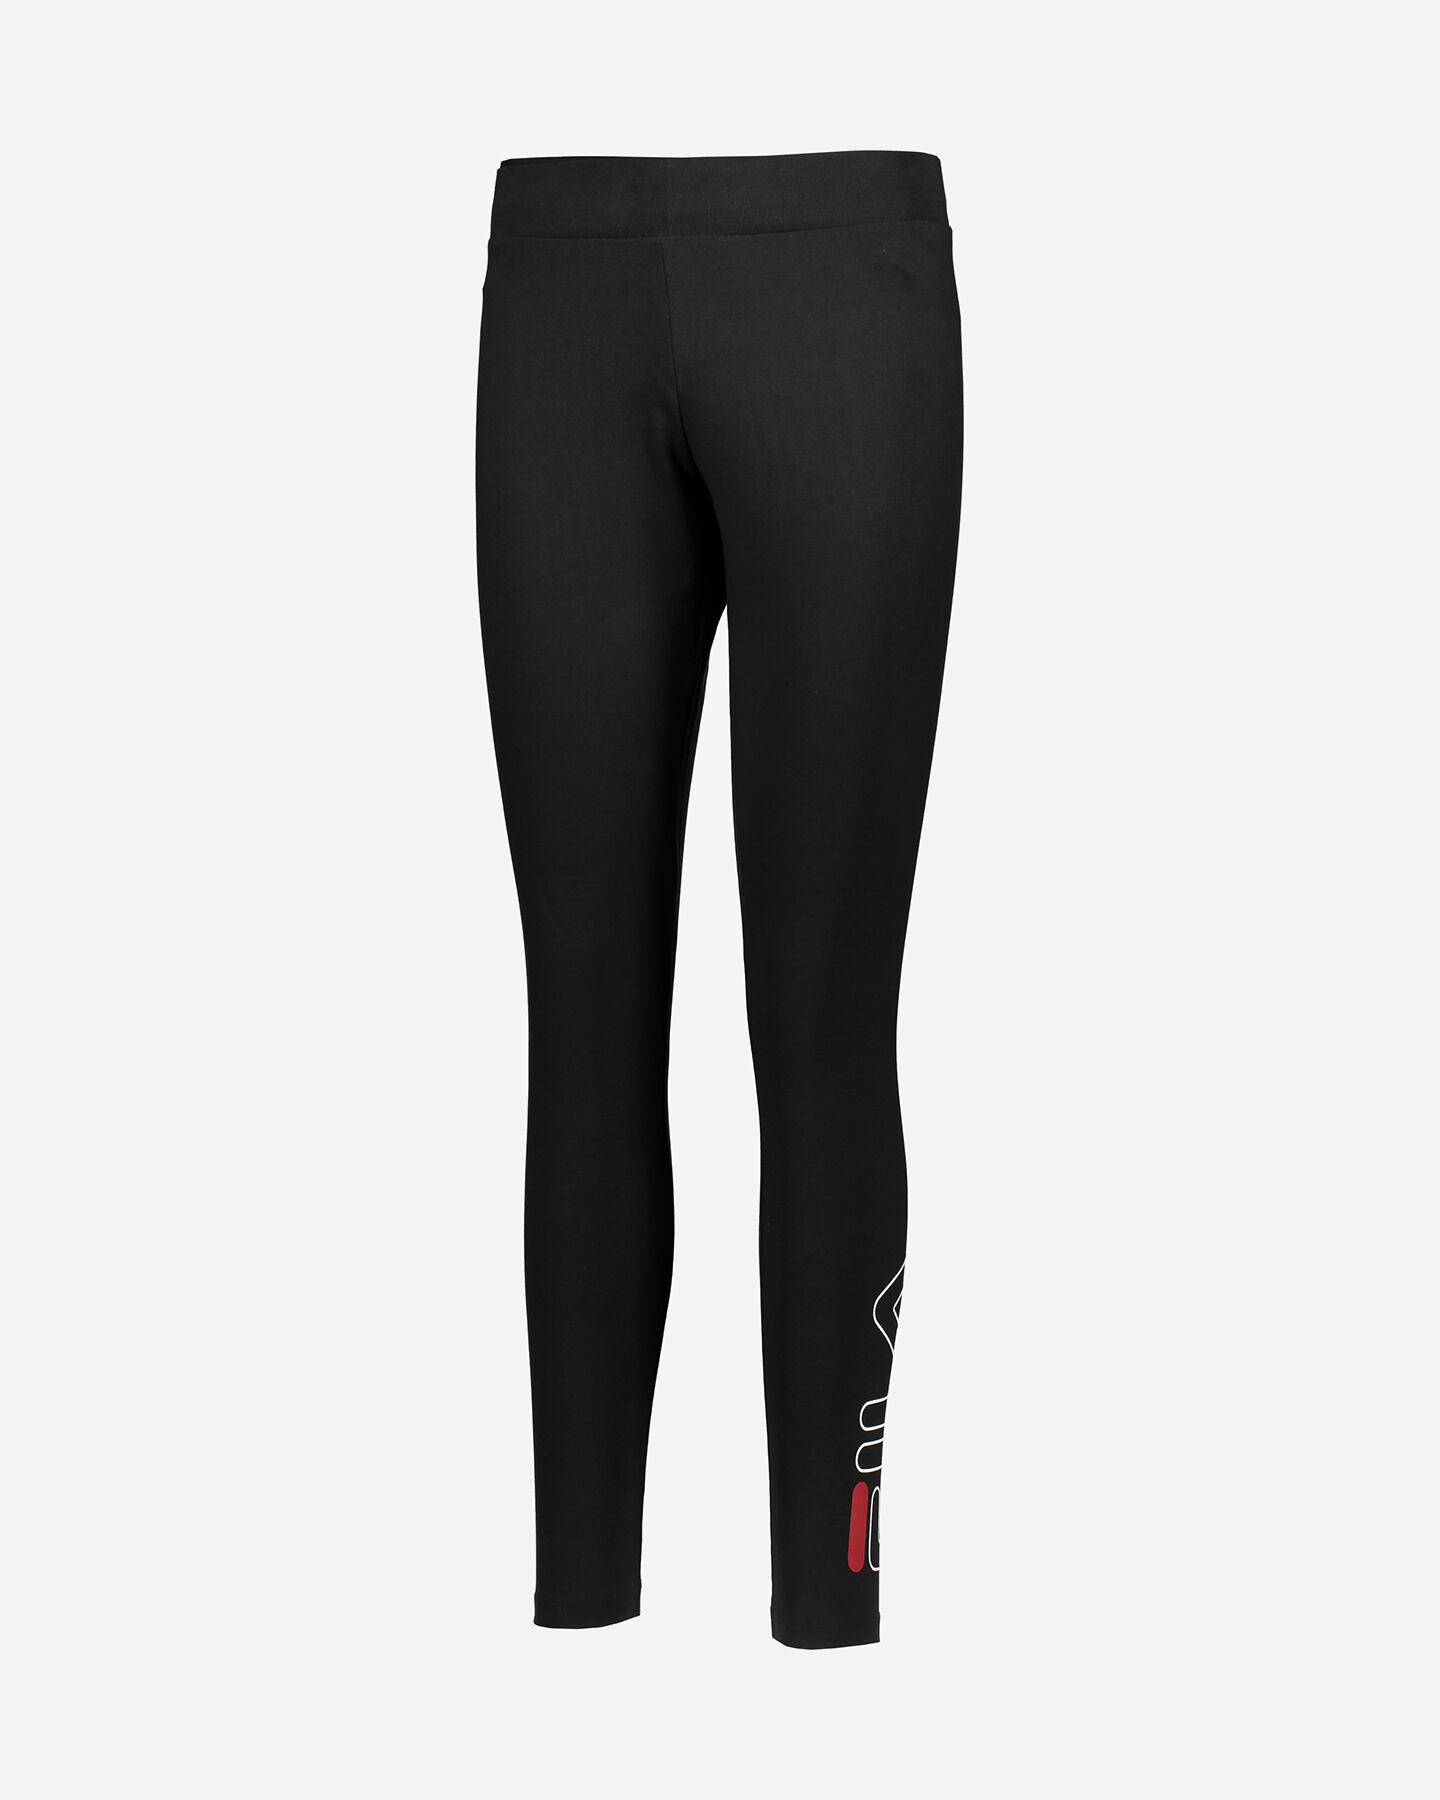 E Felpe Cisalfa Sport Intimo T Pantaloni Shirt Donna Da Sportivo n5FxztT